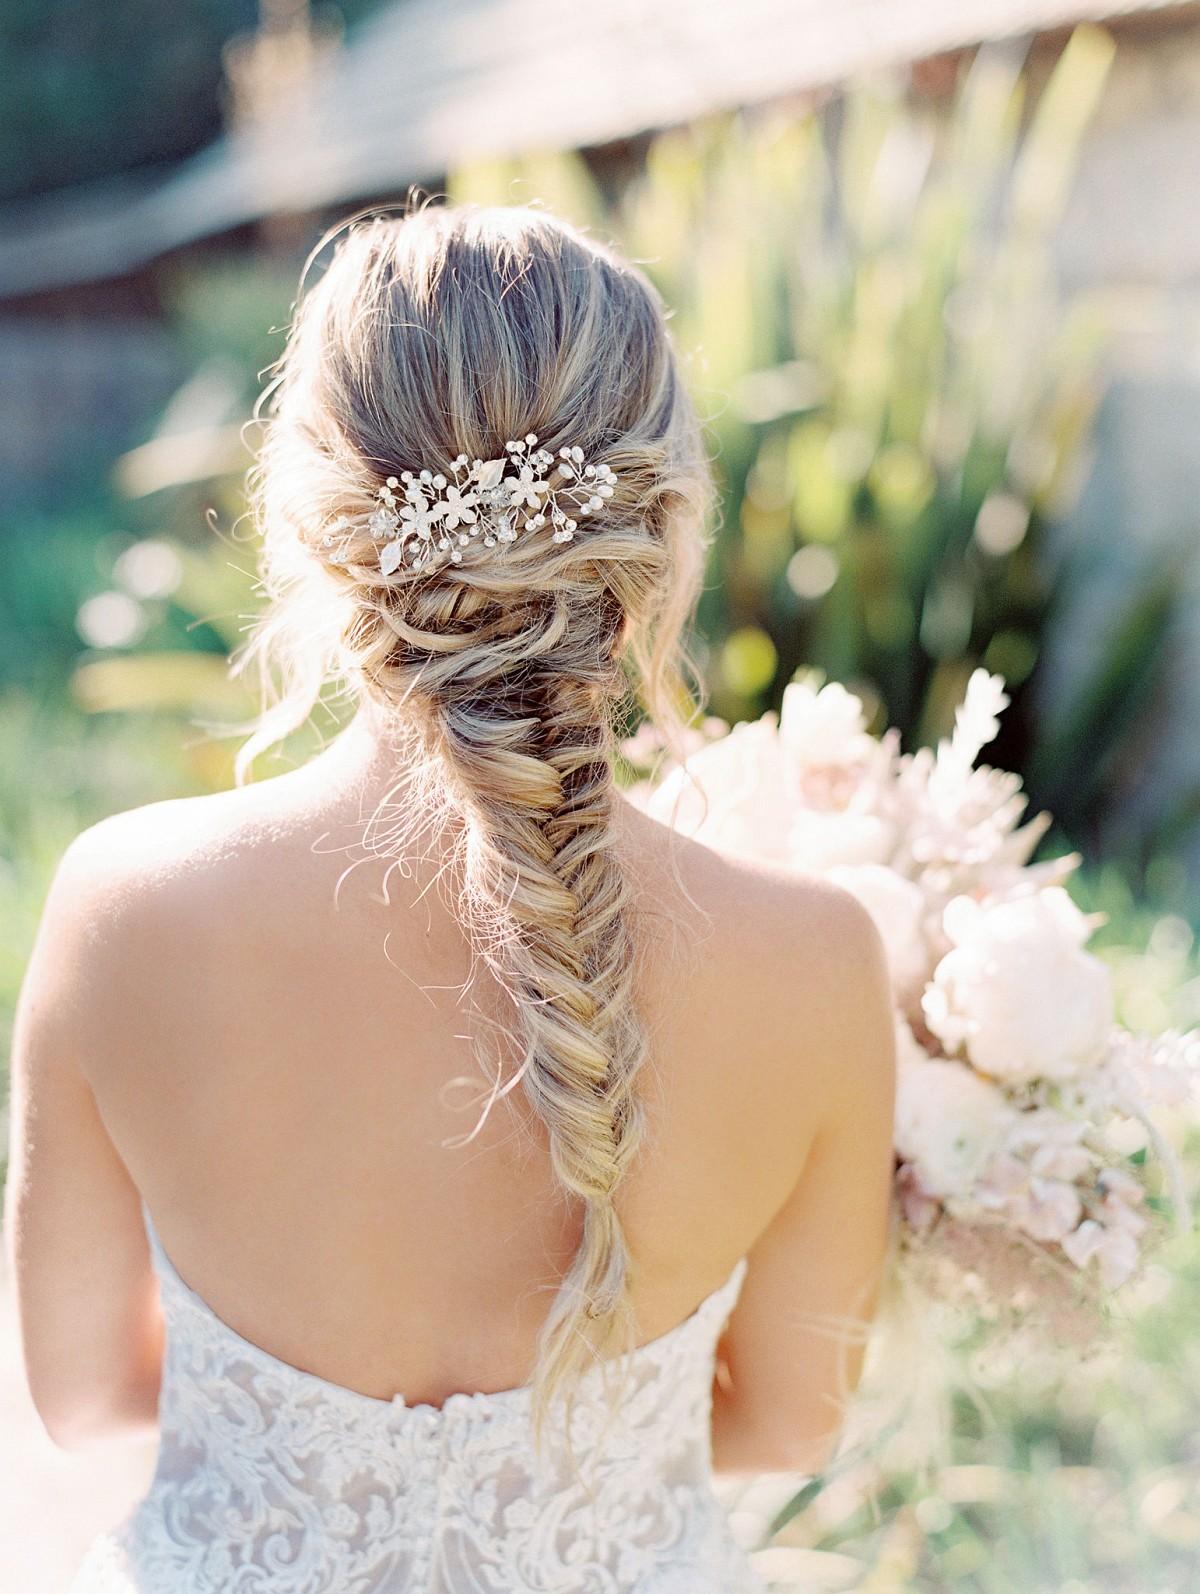 Best bridal hairstyles